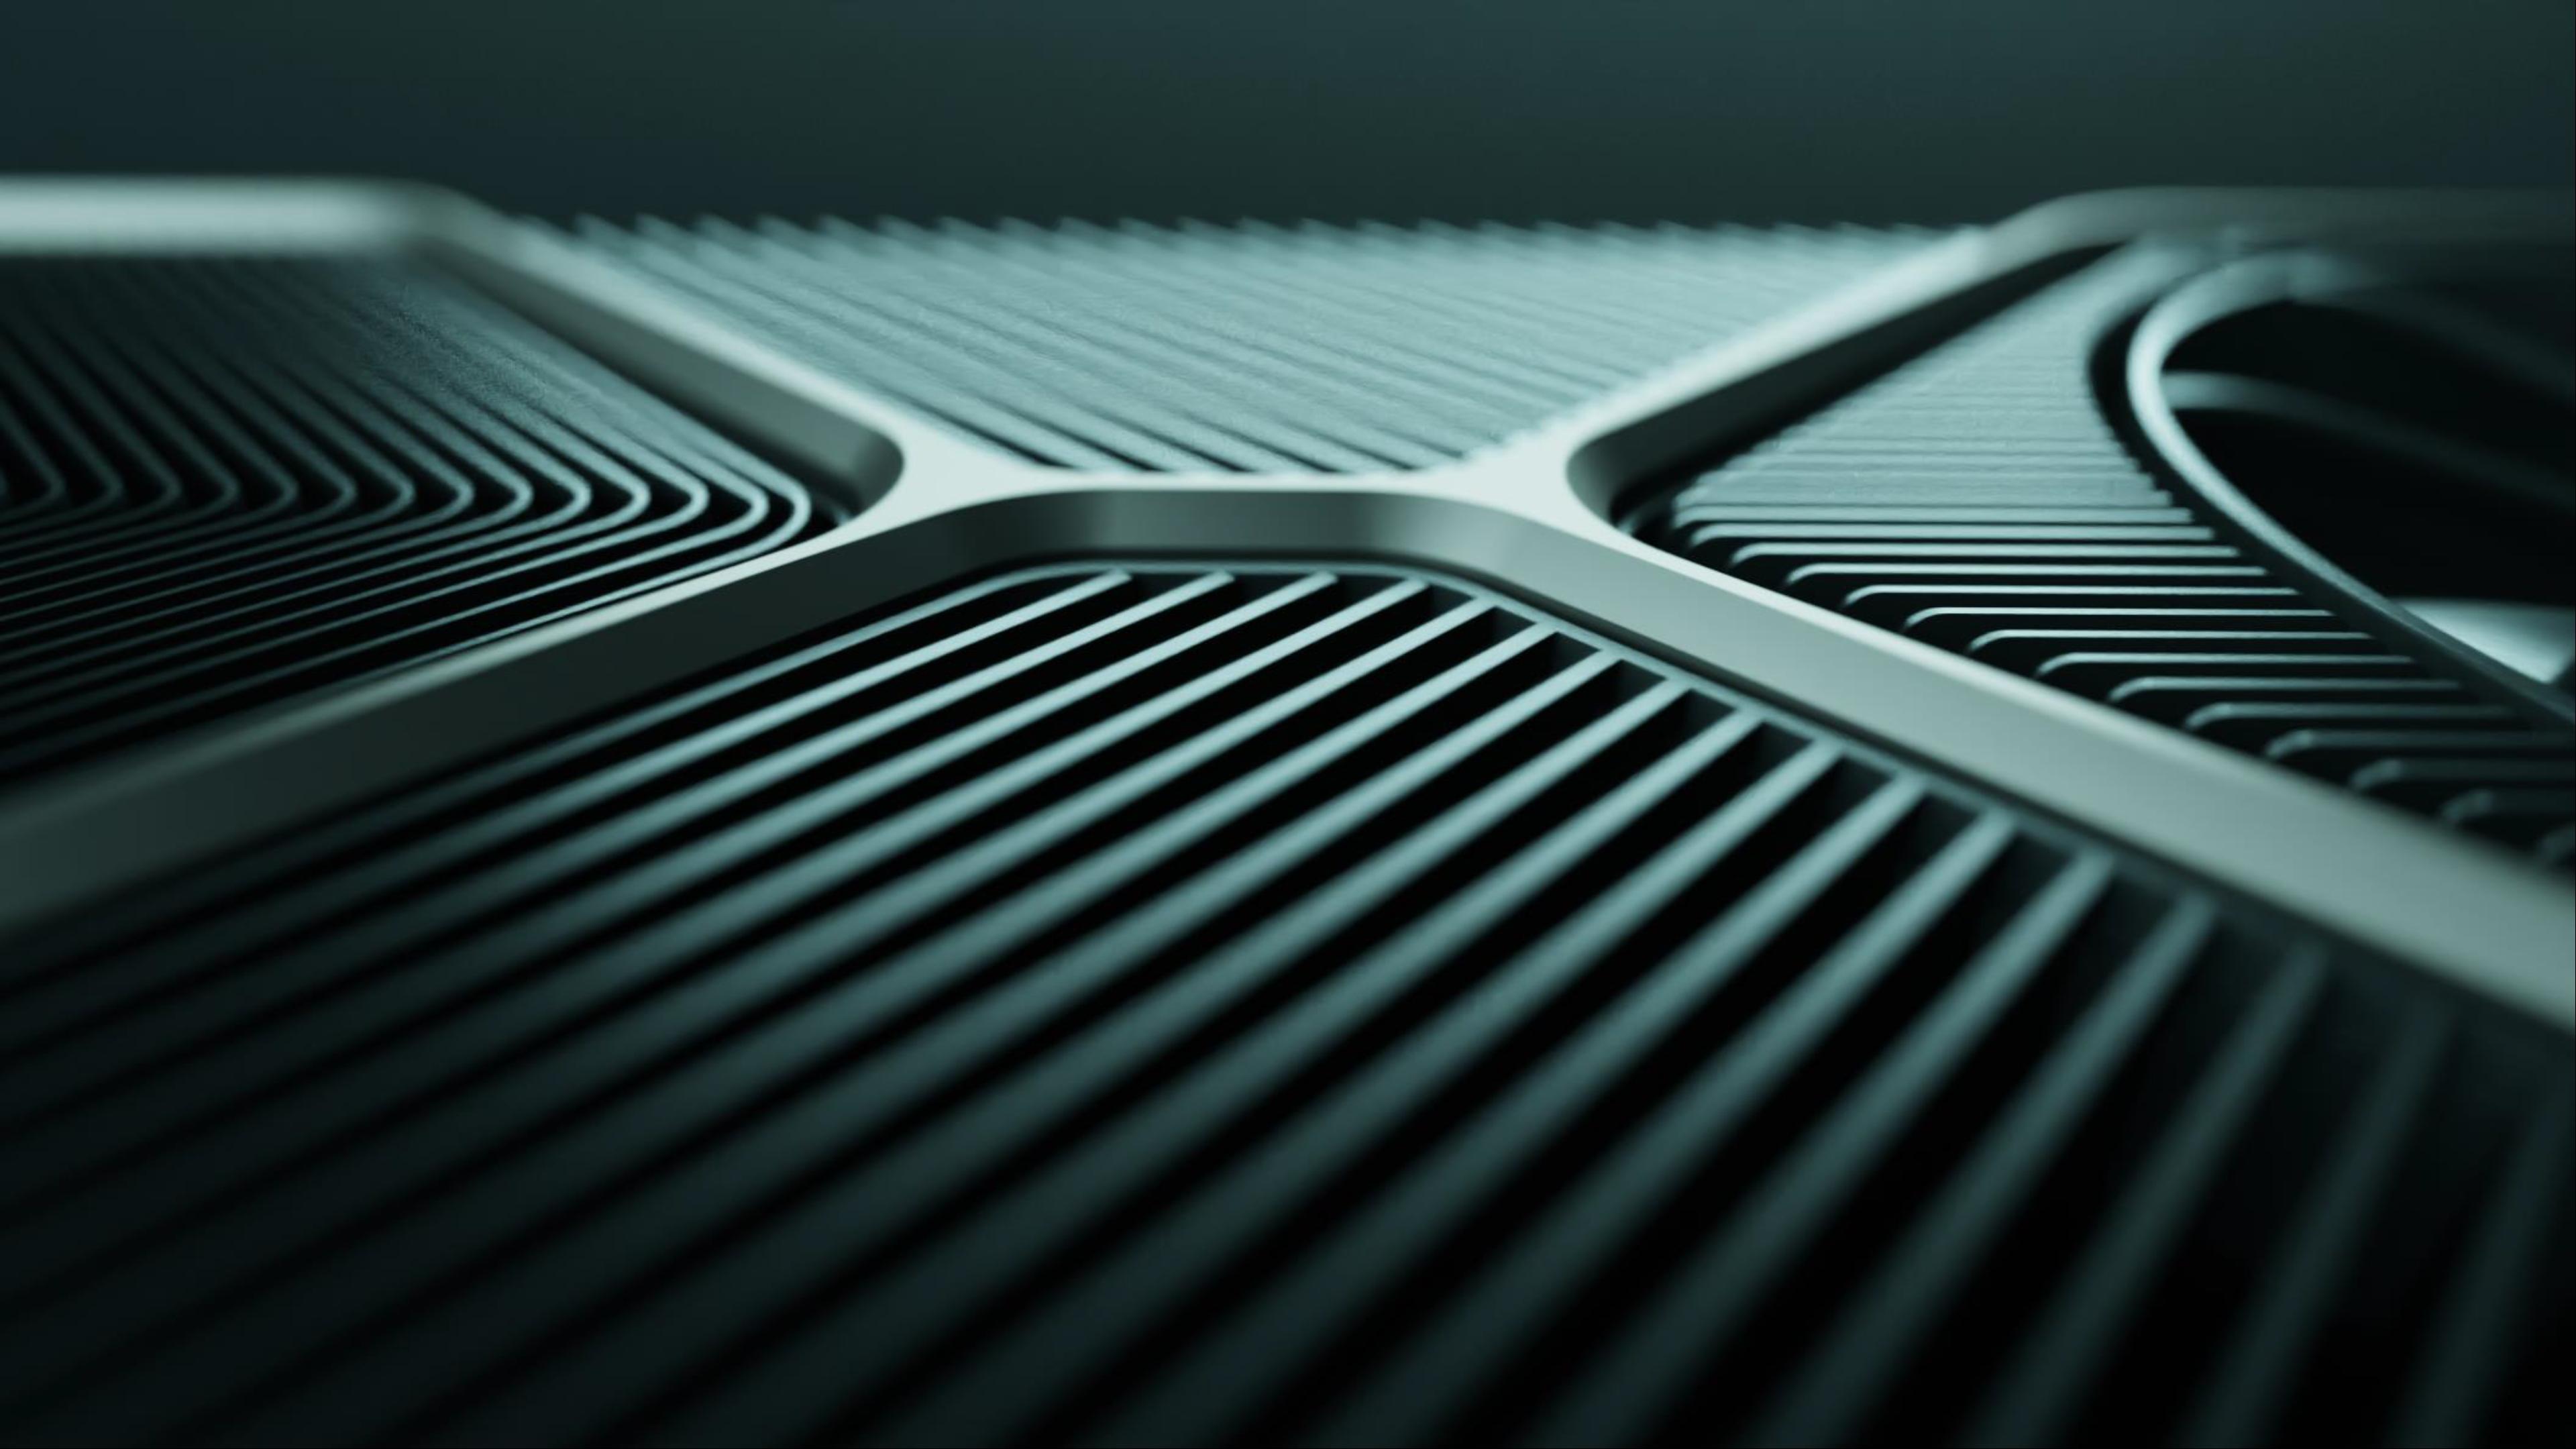 Nvidia Geforce Rtx 3080 Ethereum Mining Performance Leaks Out Nvidia geforce rtx 3080 ampere gaming graphics card render. nvidia geforce rtx 3080 ethereum mining